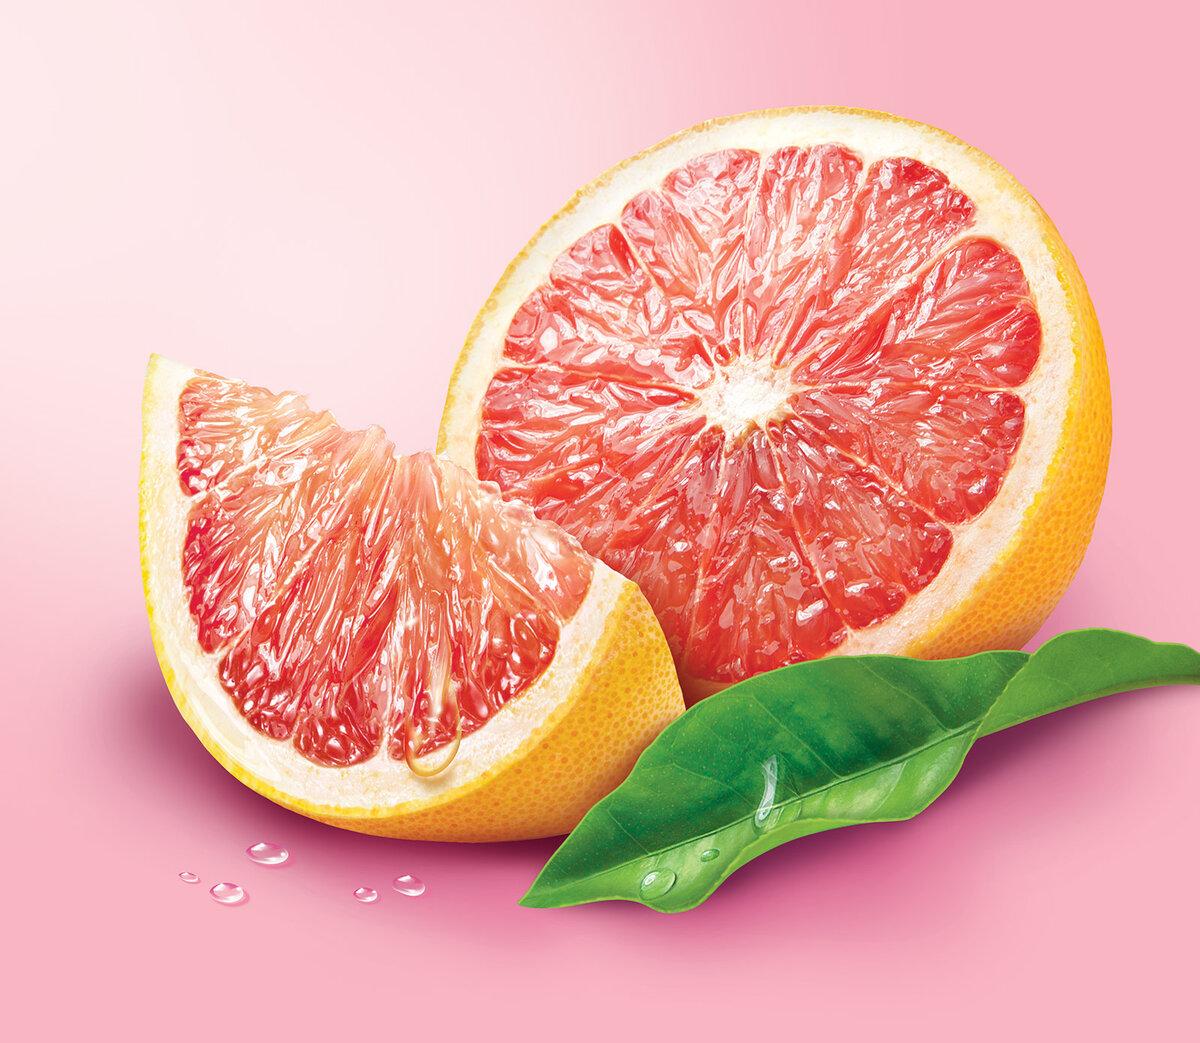 Картинка с грейпфрутом на белом фоне